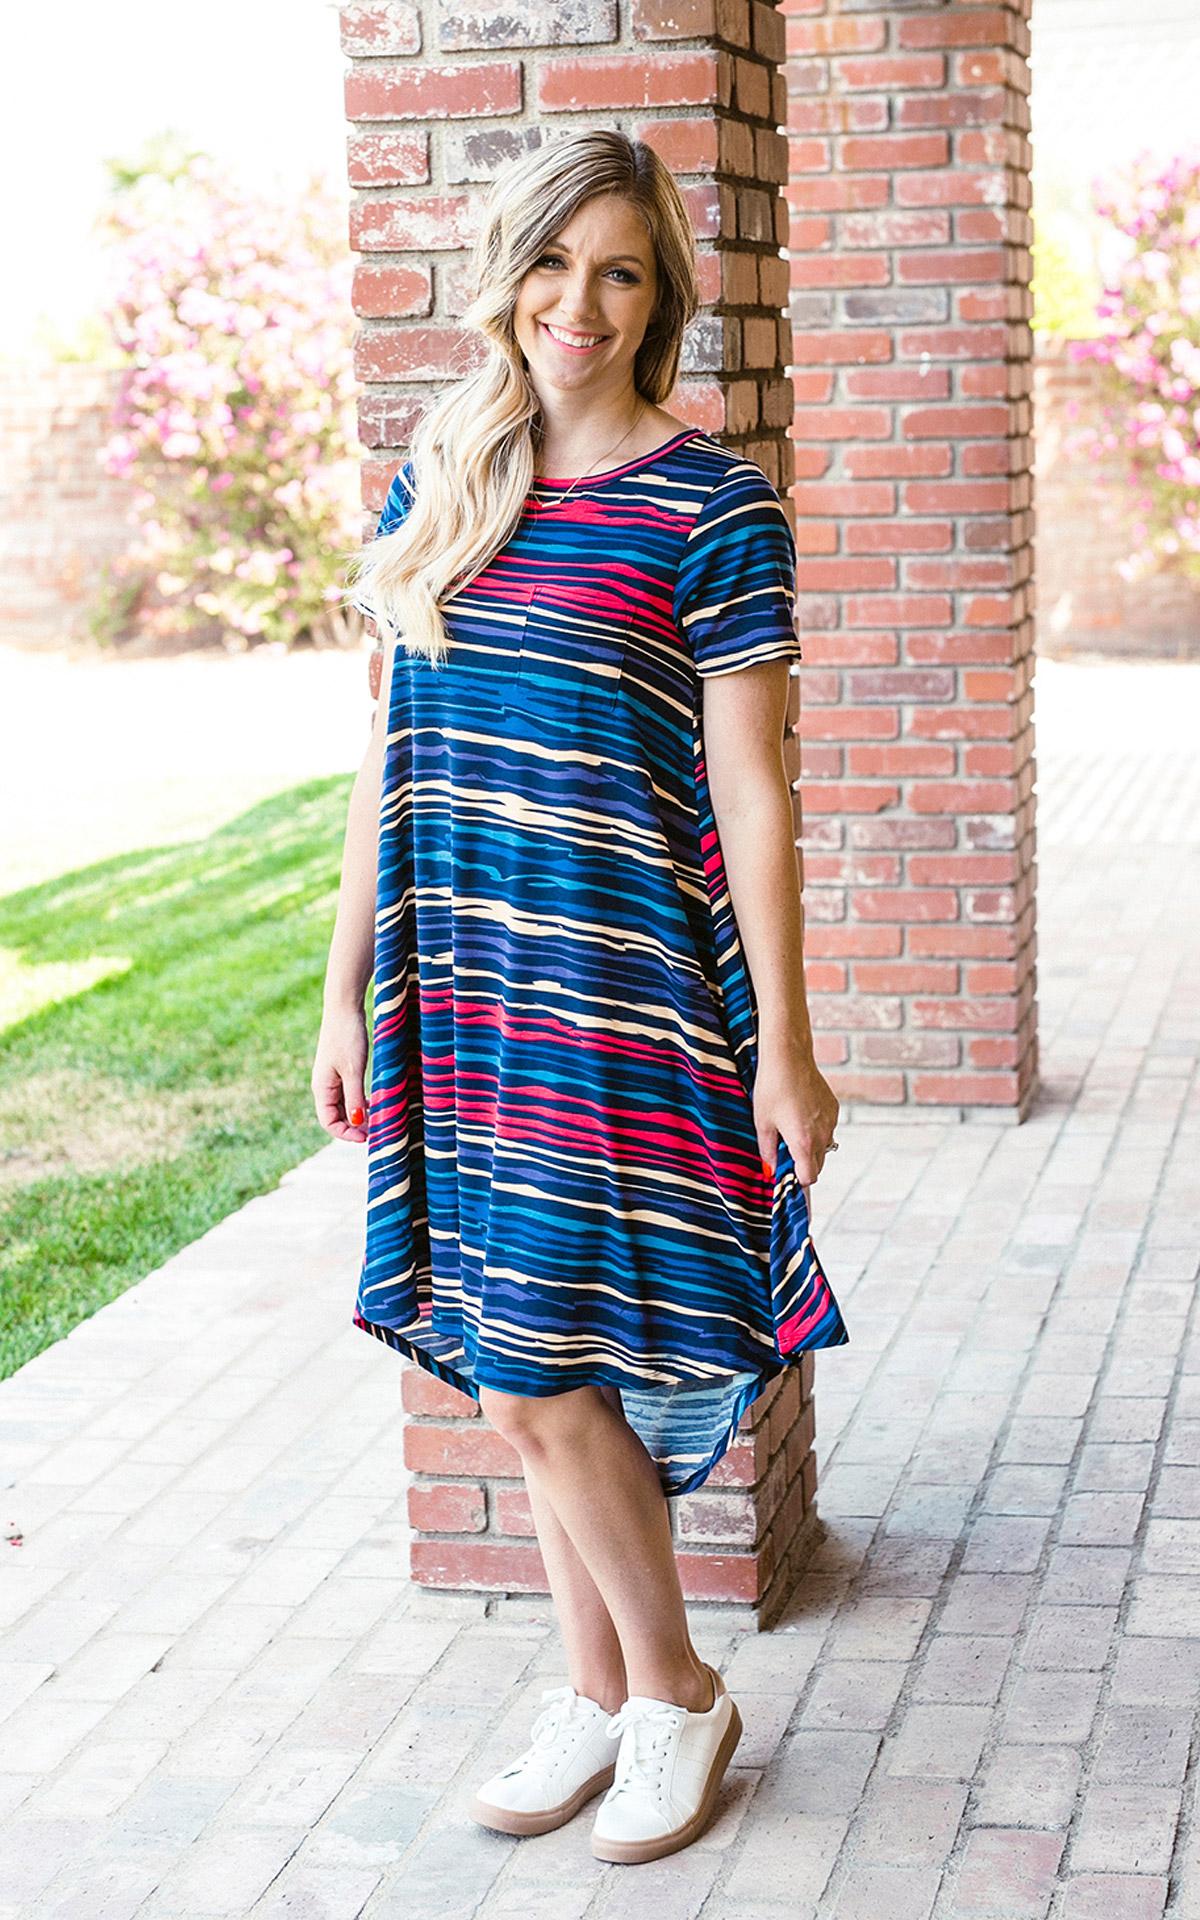 LuLaRoe-Carly-T-Shirt-High-Low-Dress-blue-red-yellow-stripes.jpg